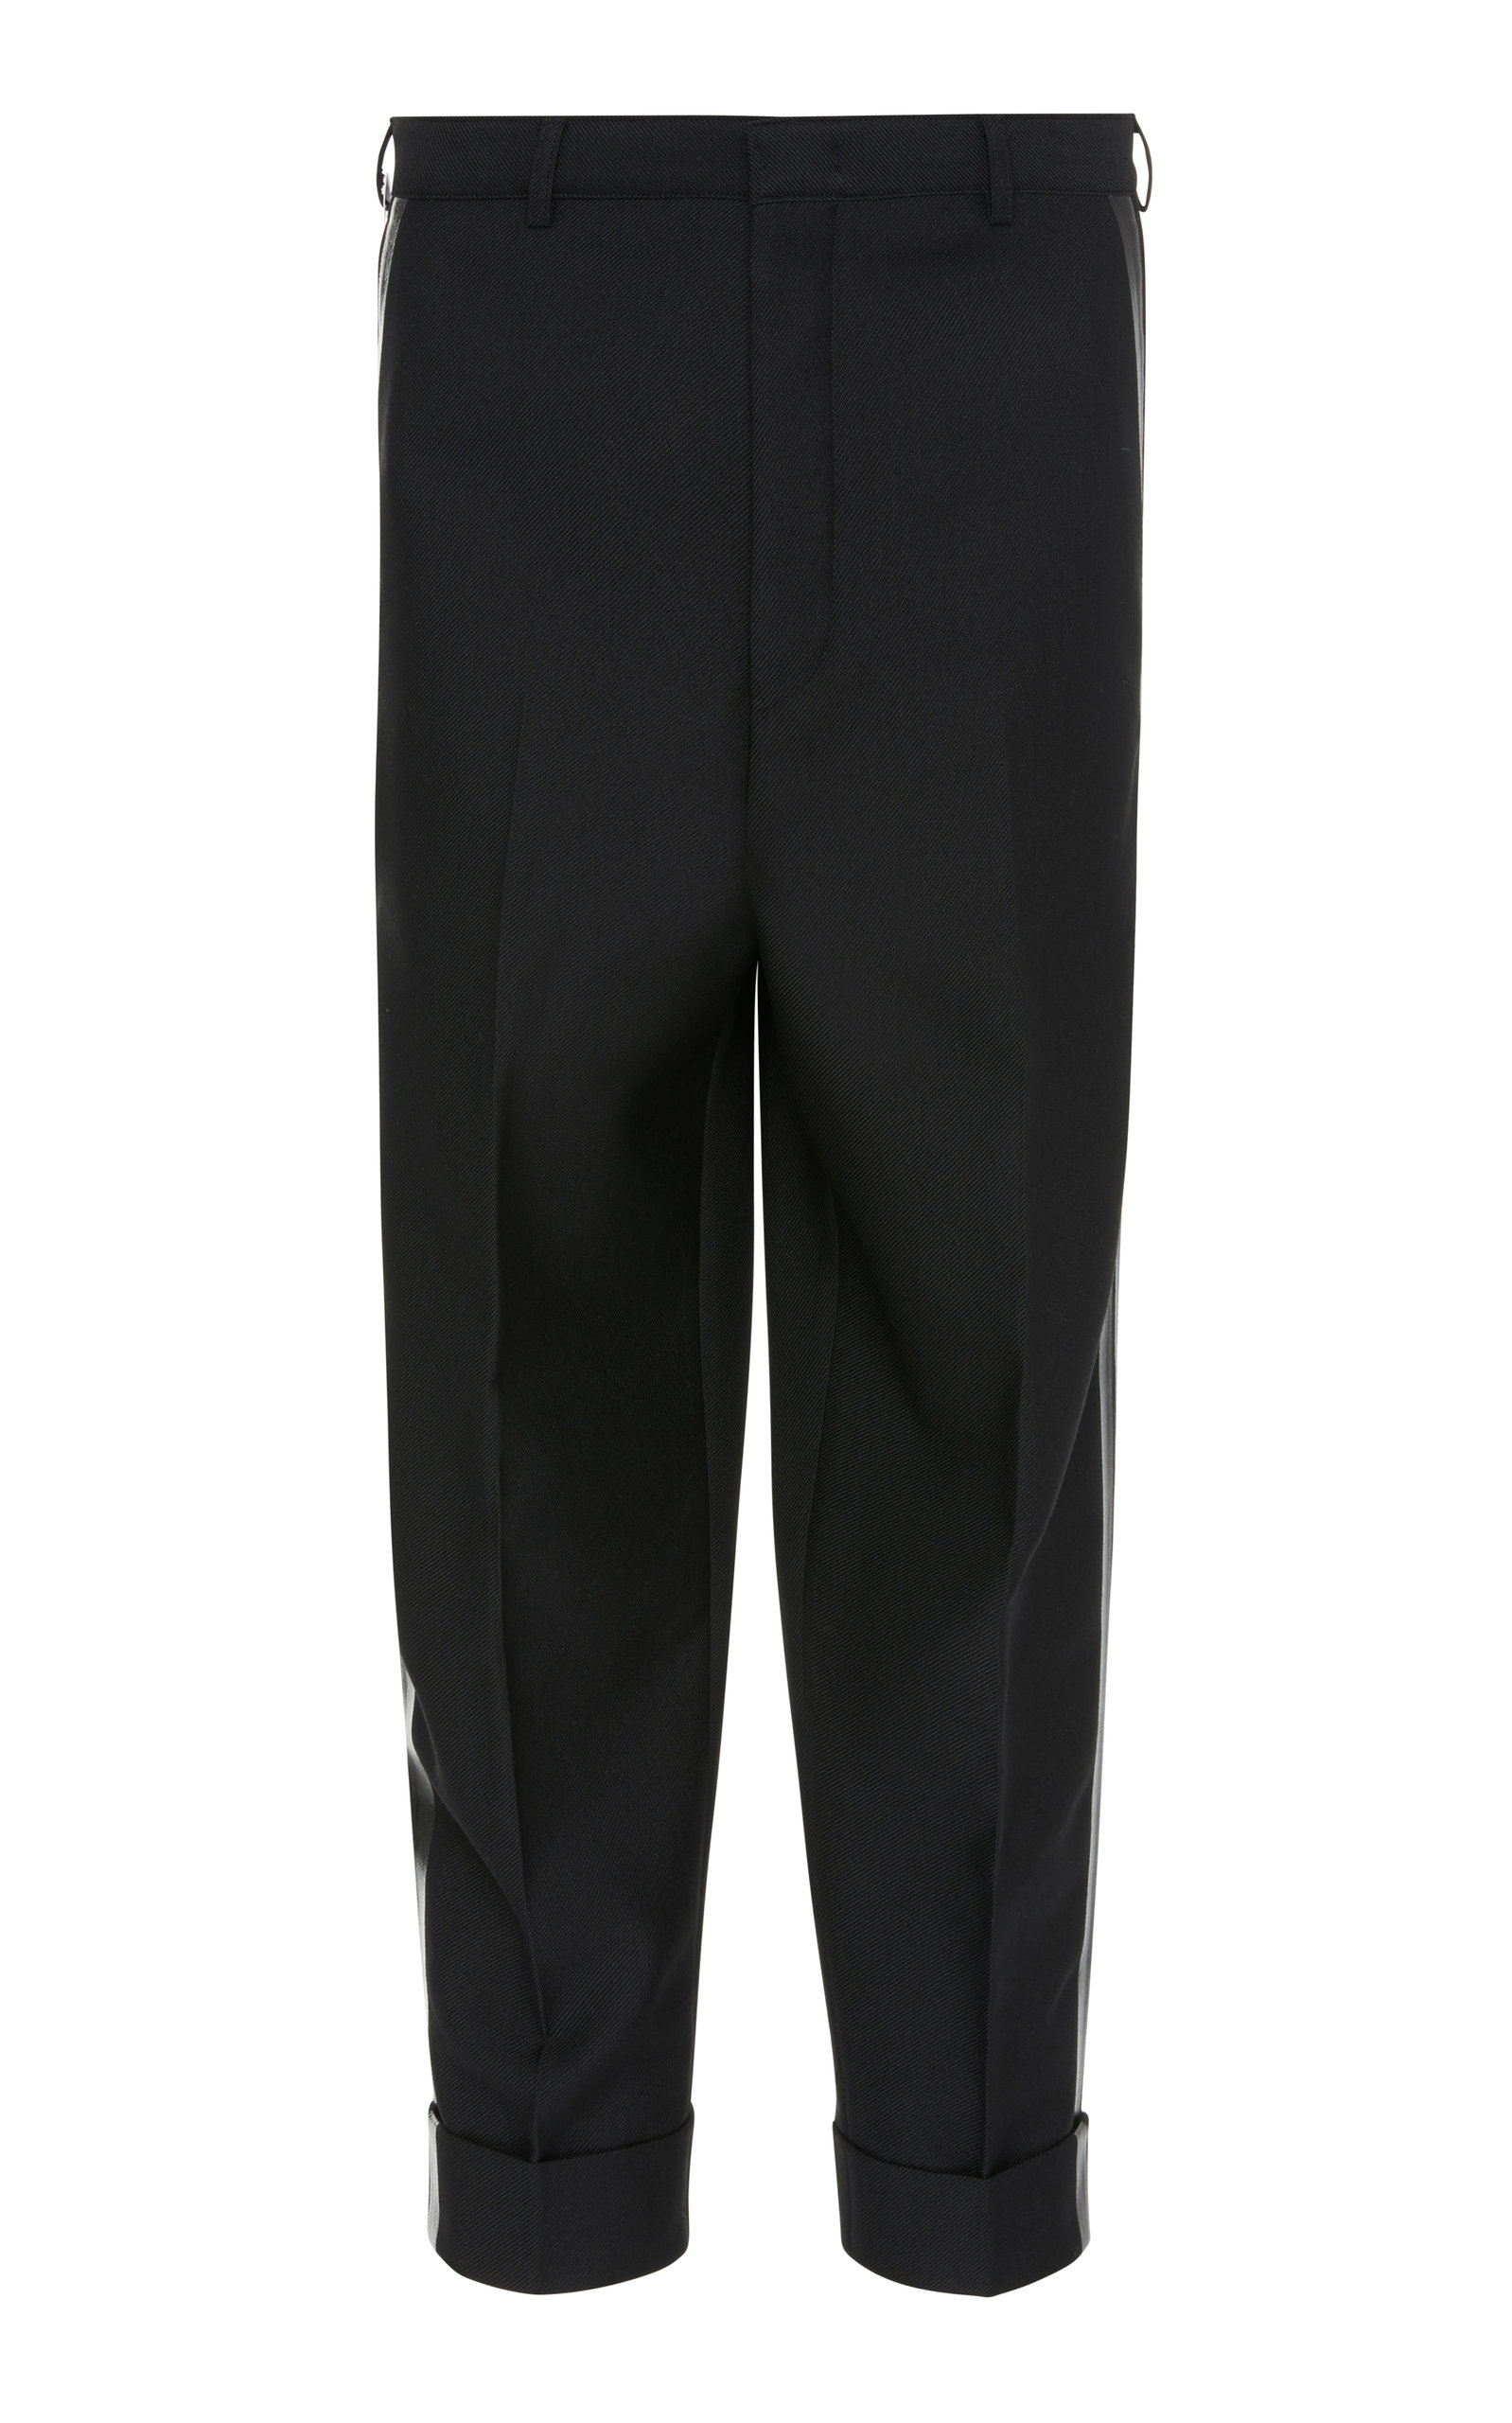 PT FORWARD Striped Twill Straight-Leg Pants in Black